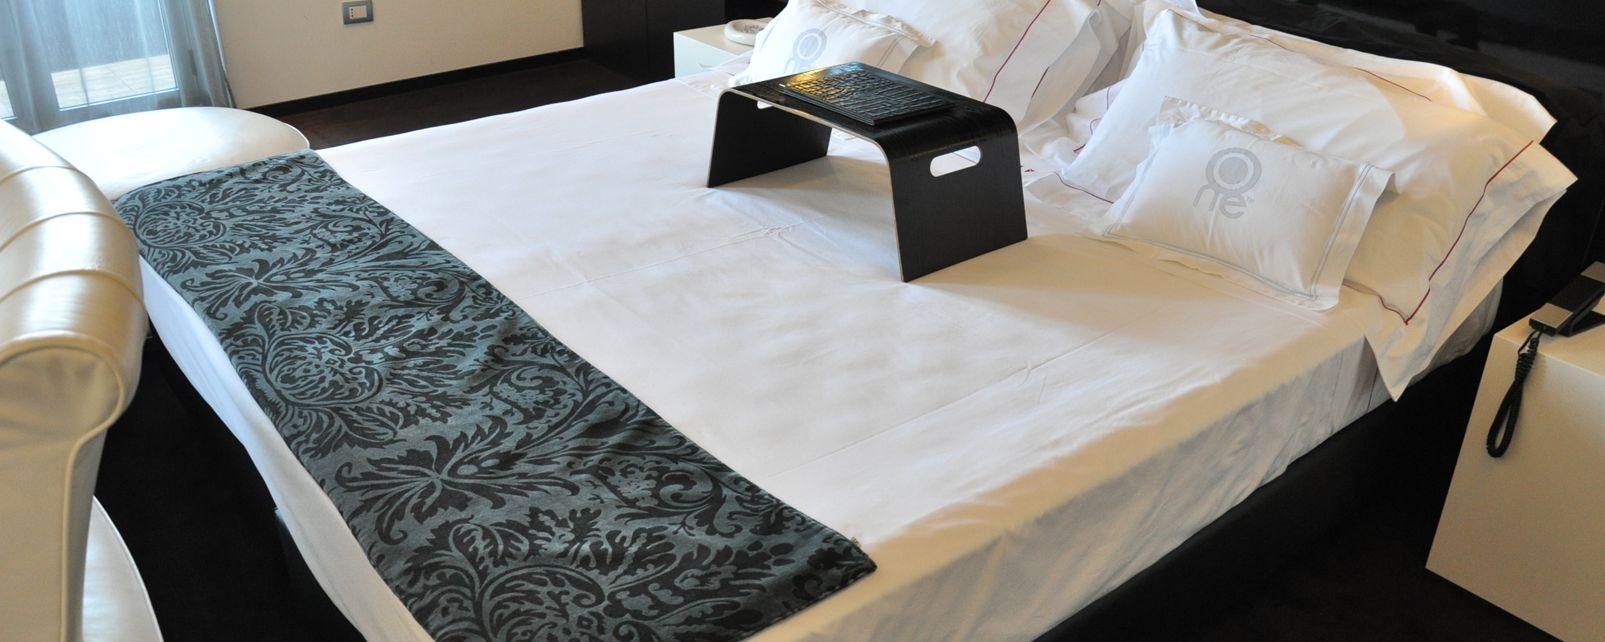 Hotel una one siracusa for Una hotel siracusa